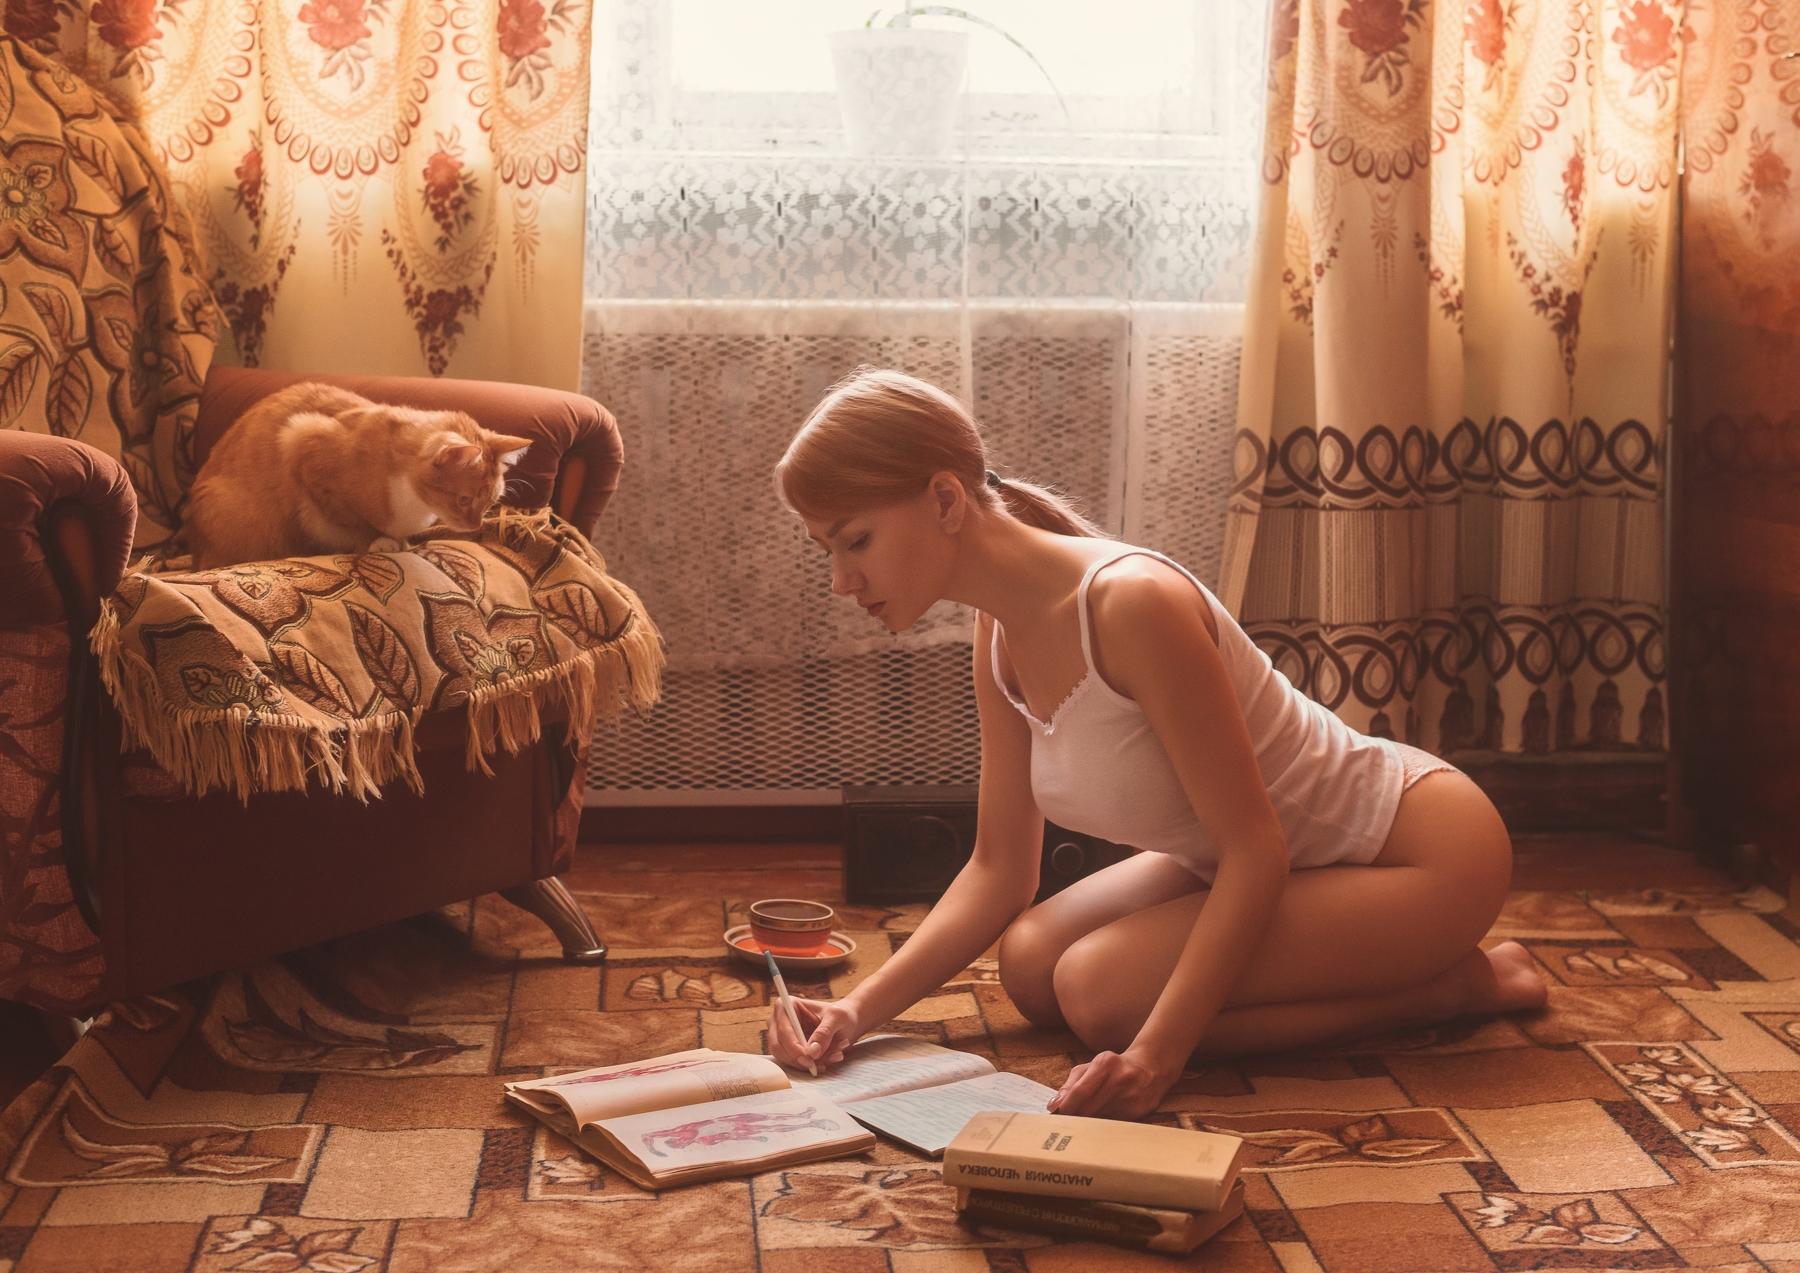 Скоро сессия / фотограф Оплетаев Владислав